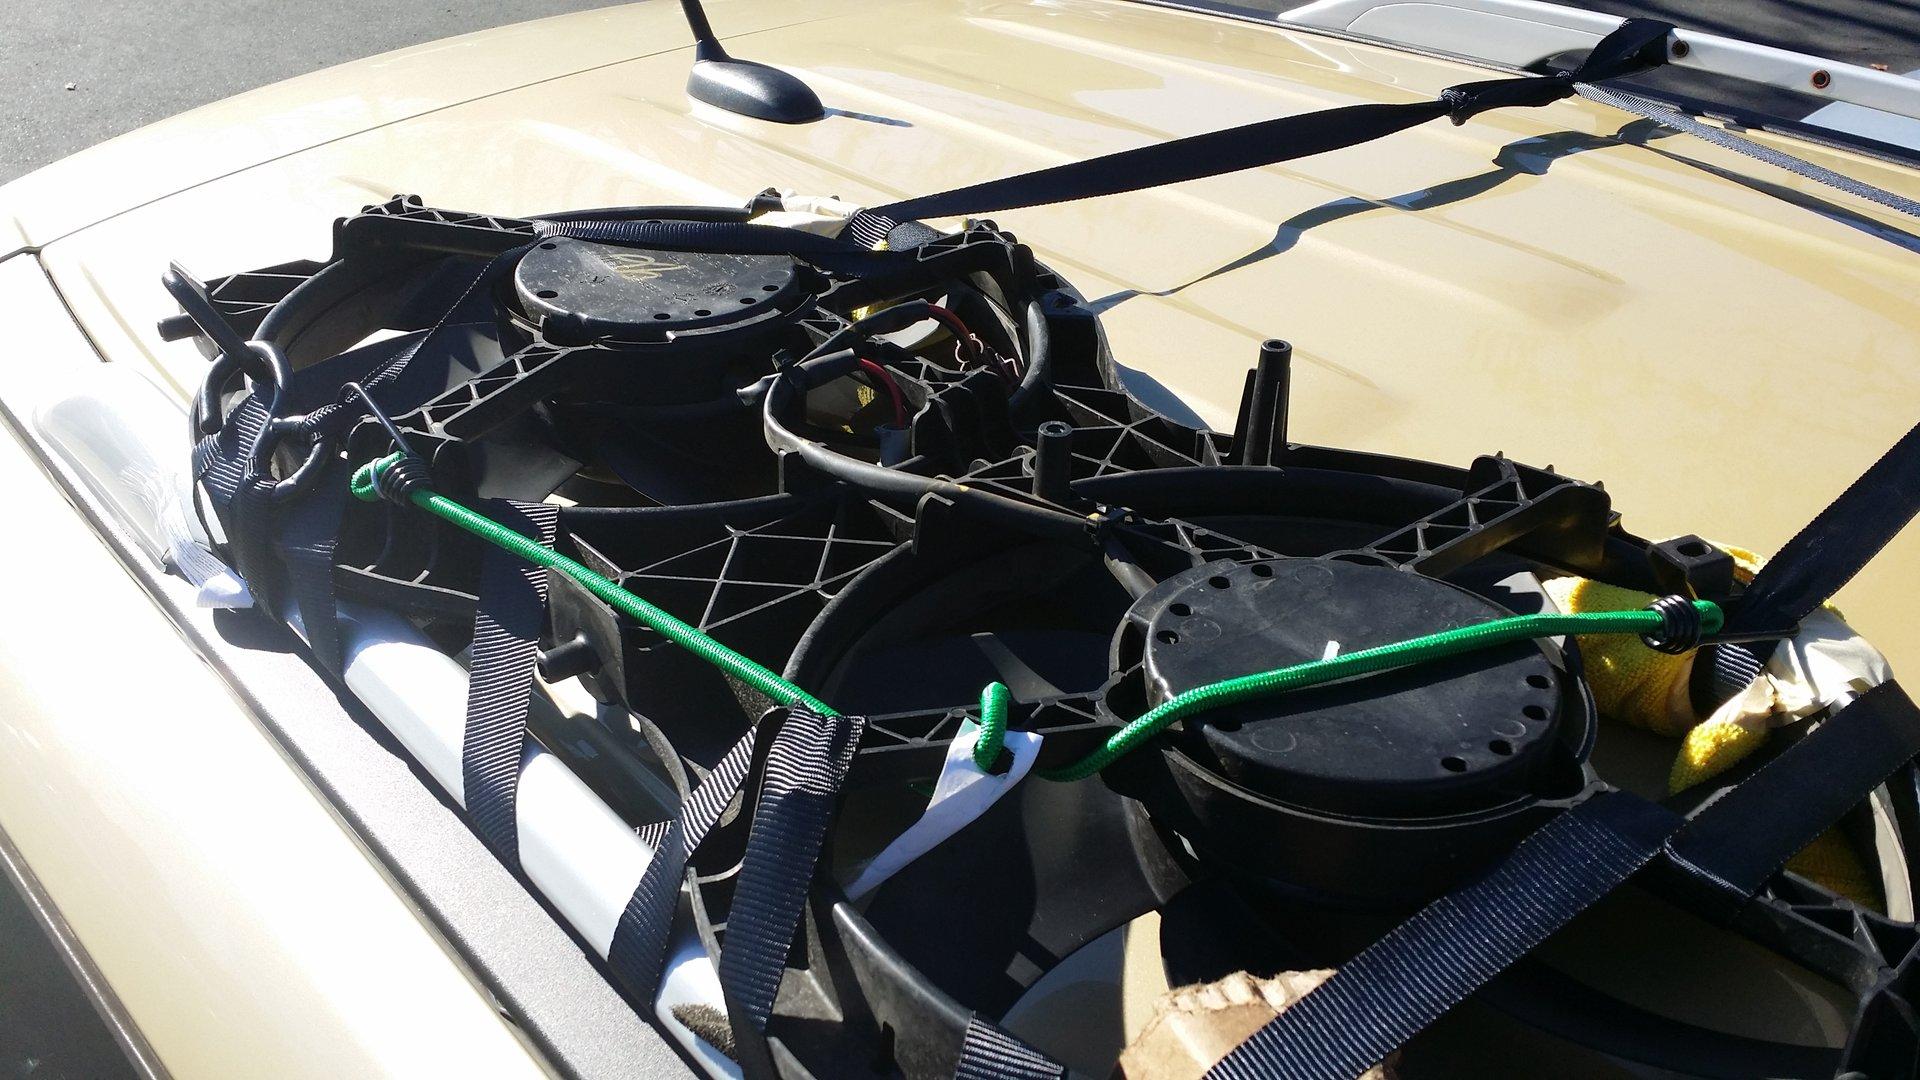 2013 Pathfinder Radiator Fan broken @ 50000miles | Nissan Pathfinder